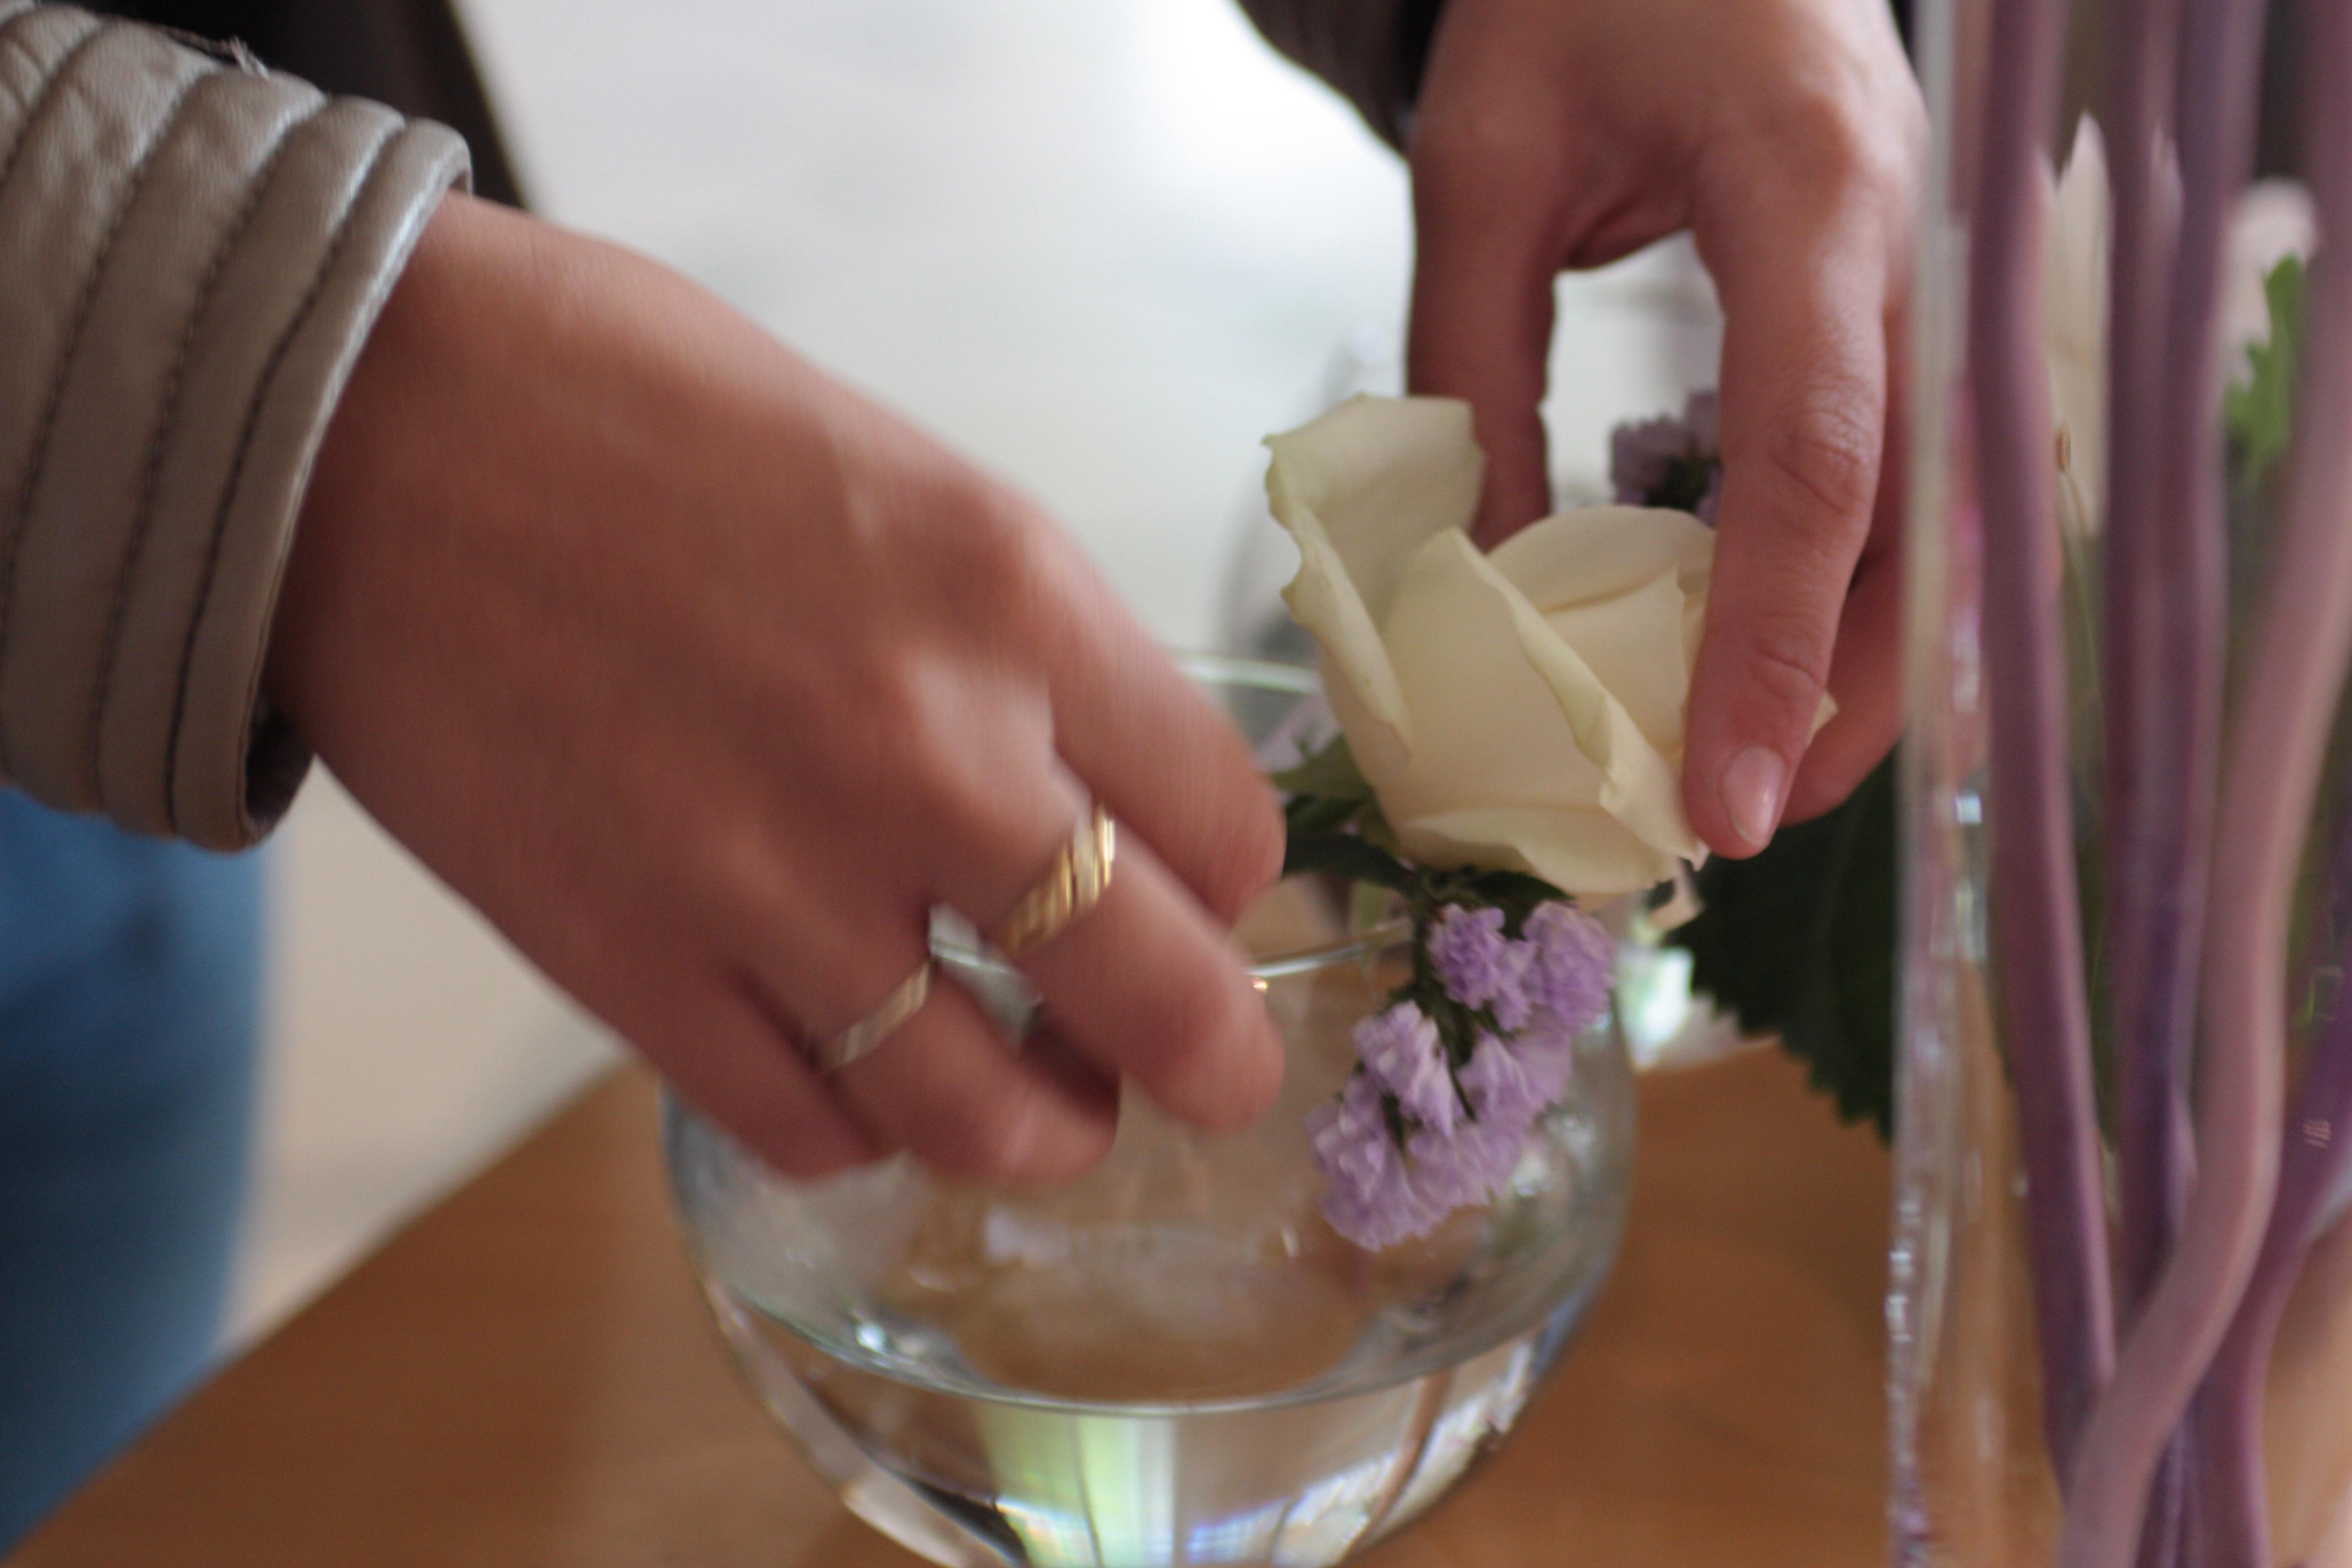 votre formation dorganisatrice de mariage wedding planner et rceptions prives - Devenir Organisatrice De Mariage